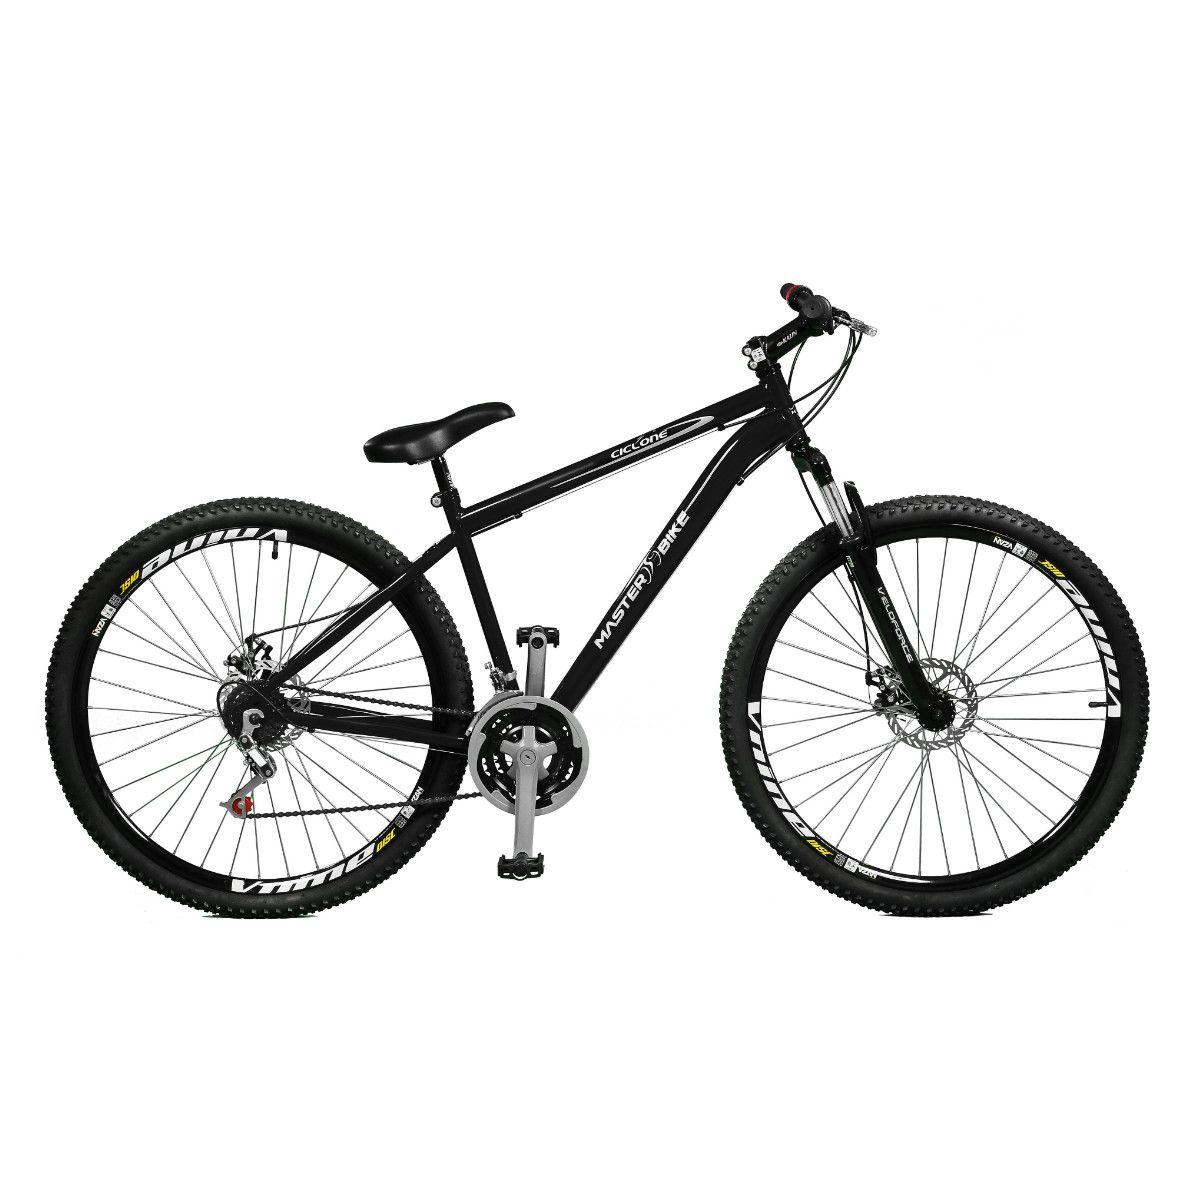 Bicicleta Master Bike Aro 29 Ciclone 21 Marchas V-Brake Preto